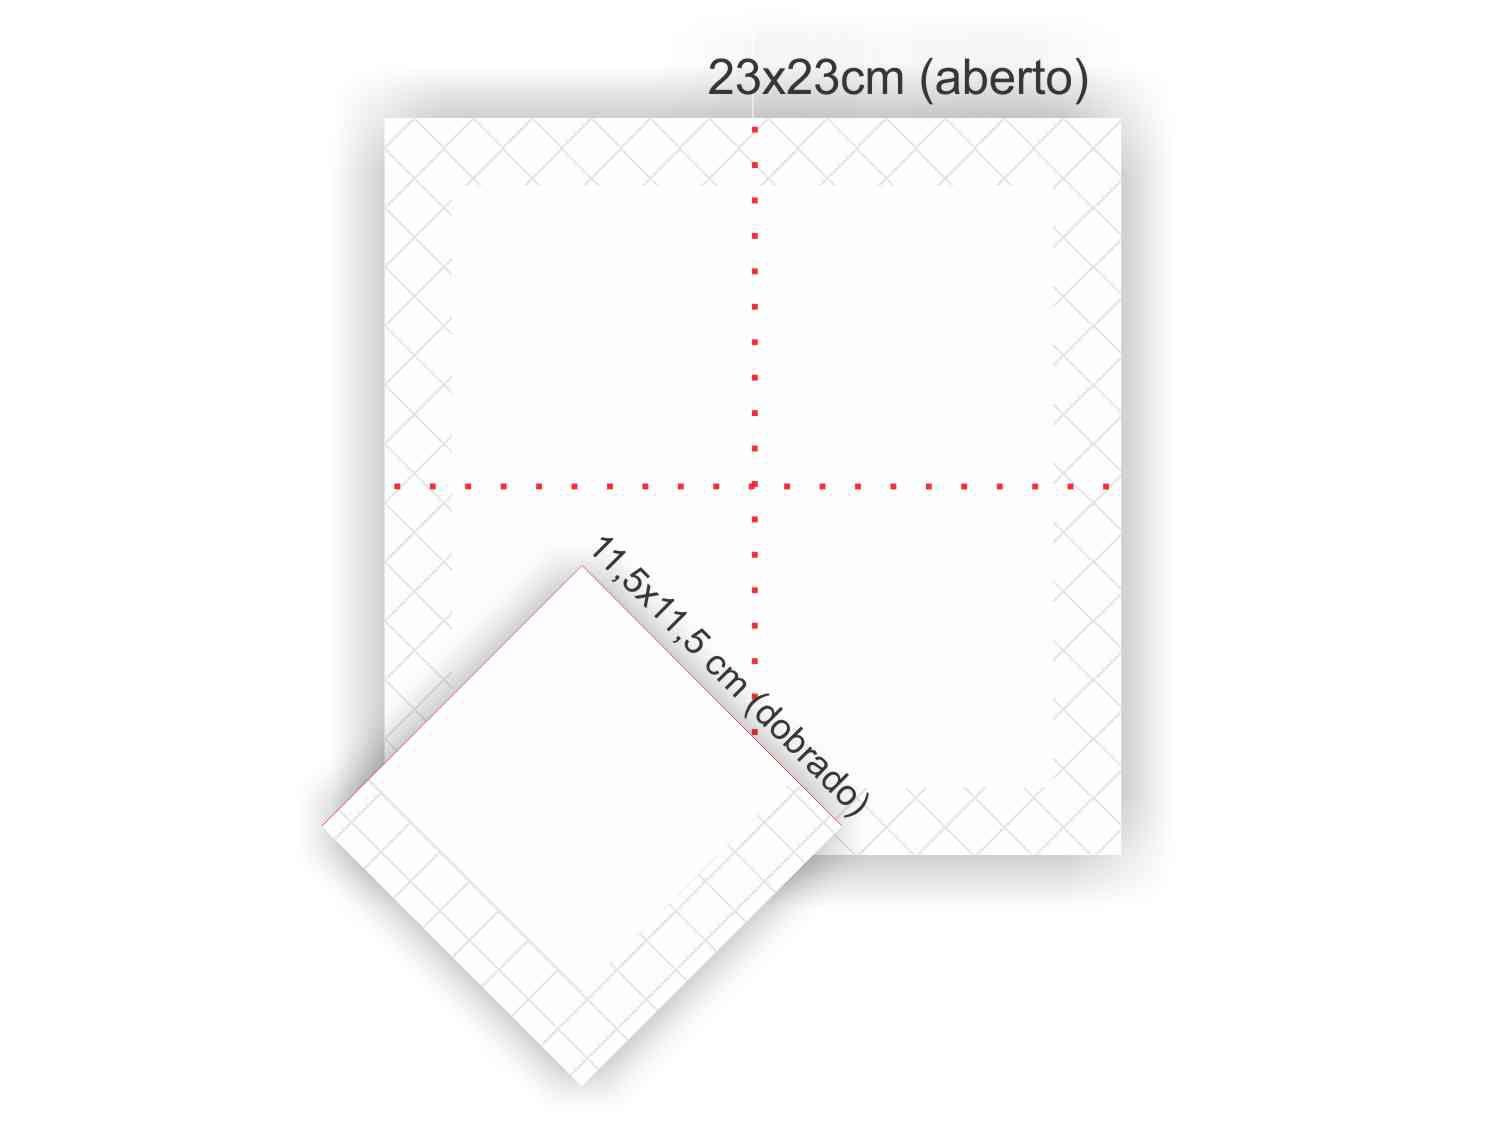 Guardanapo de papel mod. tradicional 23x23 cm Personalizado - 100 unidades  - Persona Guardanapos & Cia